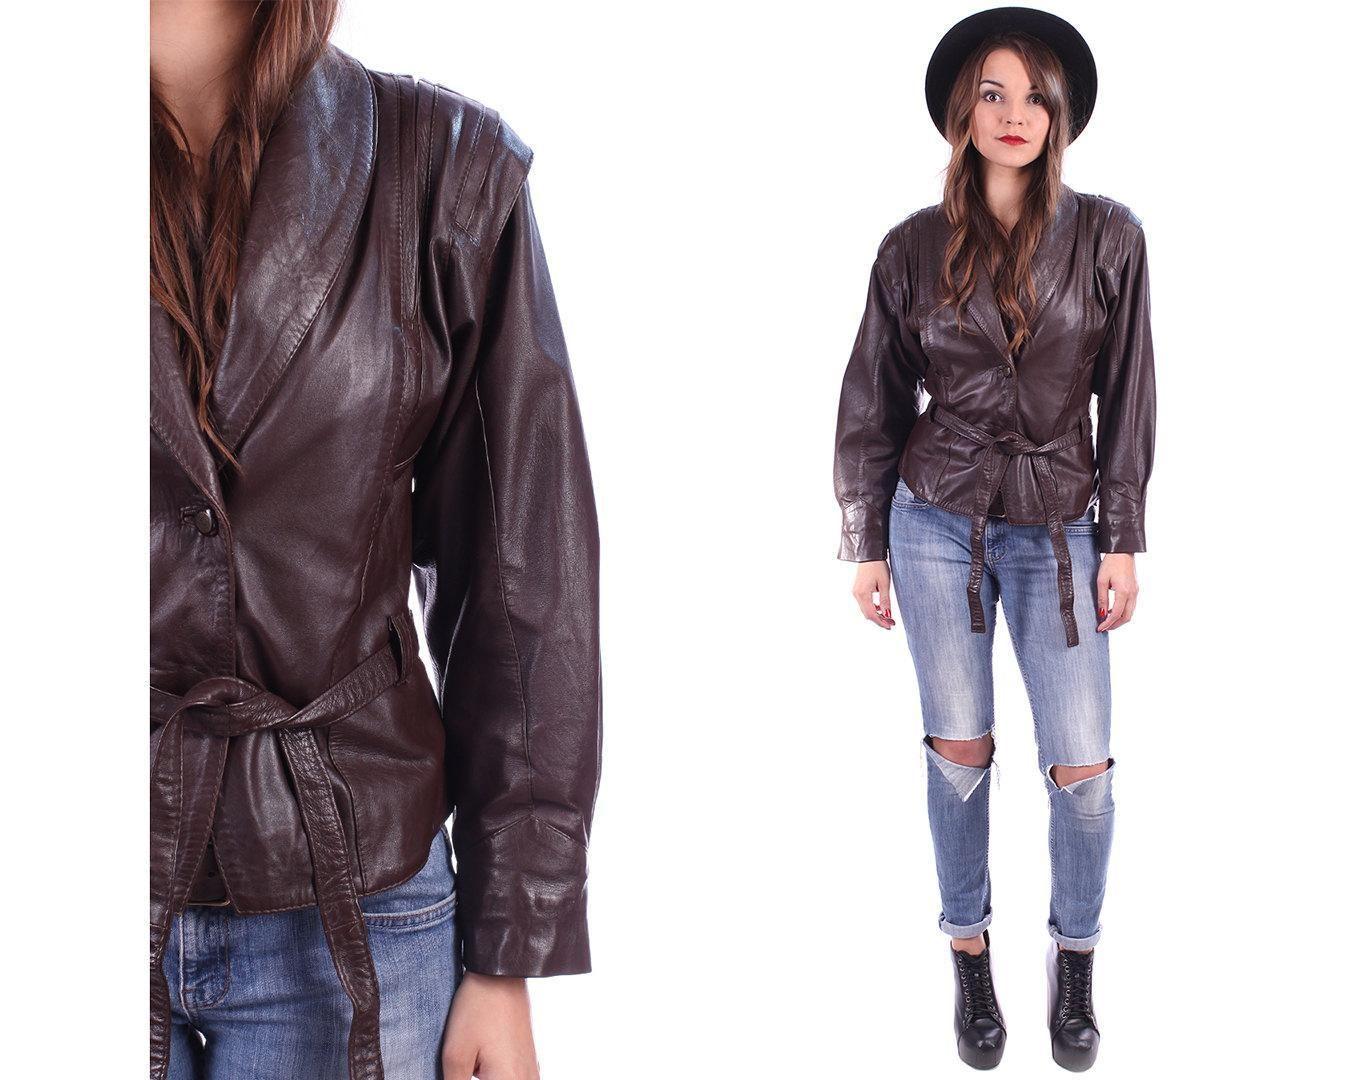 Leather BIKER Crop Jacket 80s Brown CROPPED Motorcycle Women Coat 1980s Moto Rocker Power Shoulder Button Up Retro Jacket Punk Rock Medium - http://www.gezn.com/leather-biker-crop-jacket-80s-brown-cropped-motorcycle-women-coat-1980s-moto-rocker-power-shoulder-button-up-retro-jacket-punk-rock-medium.html